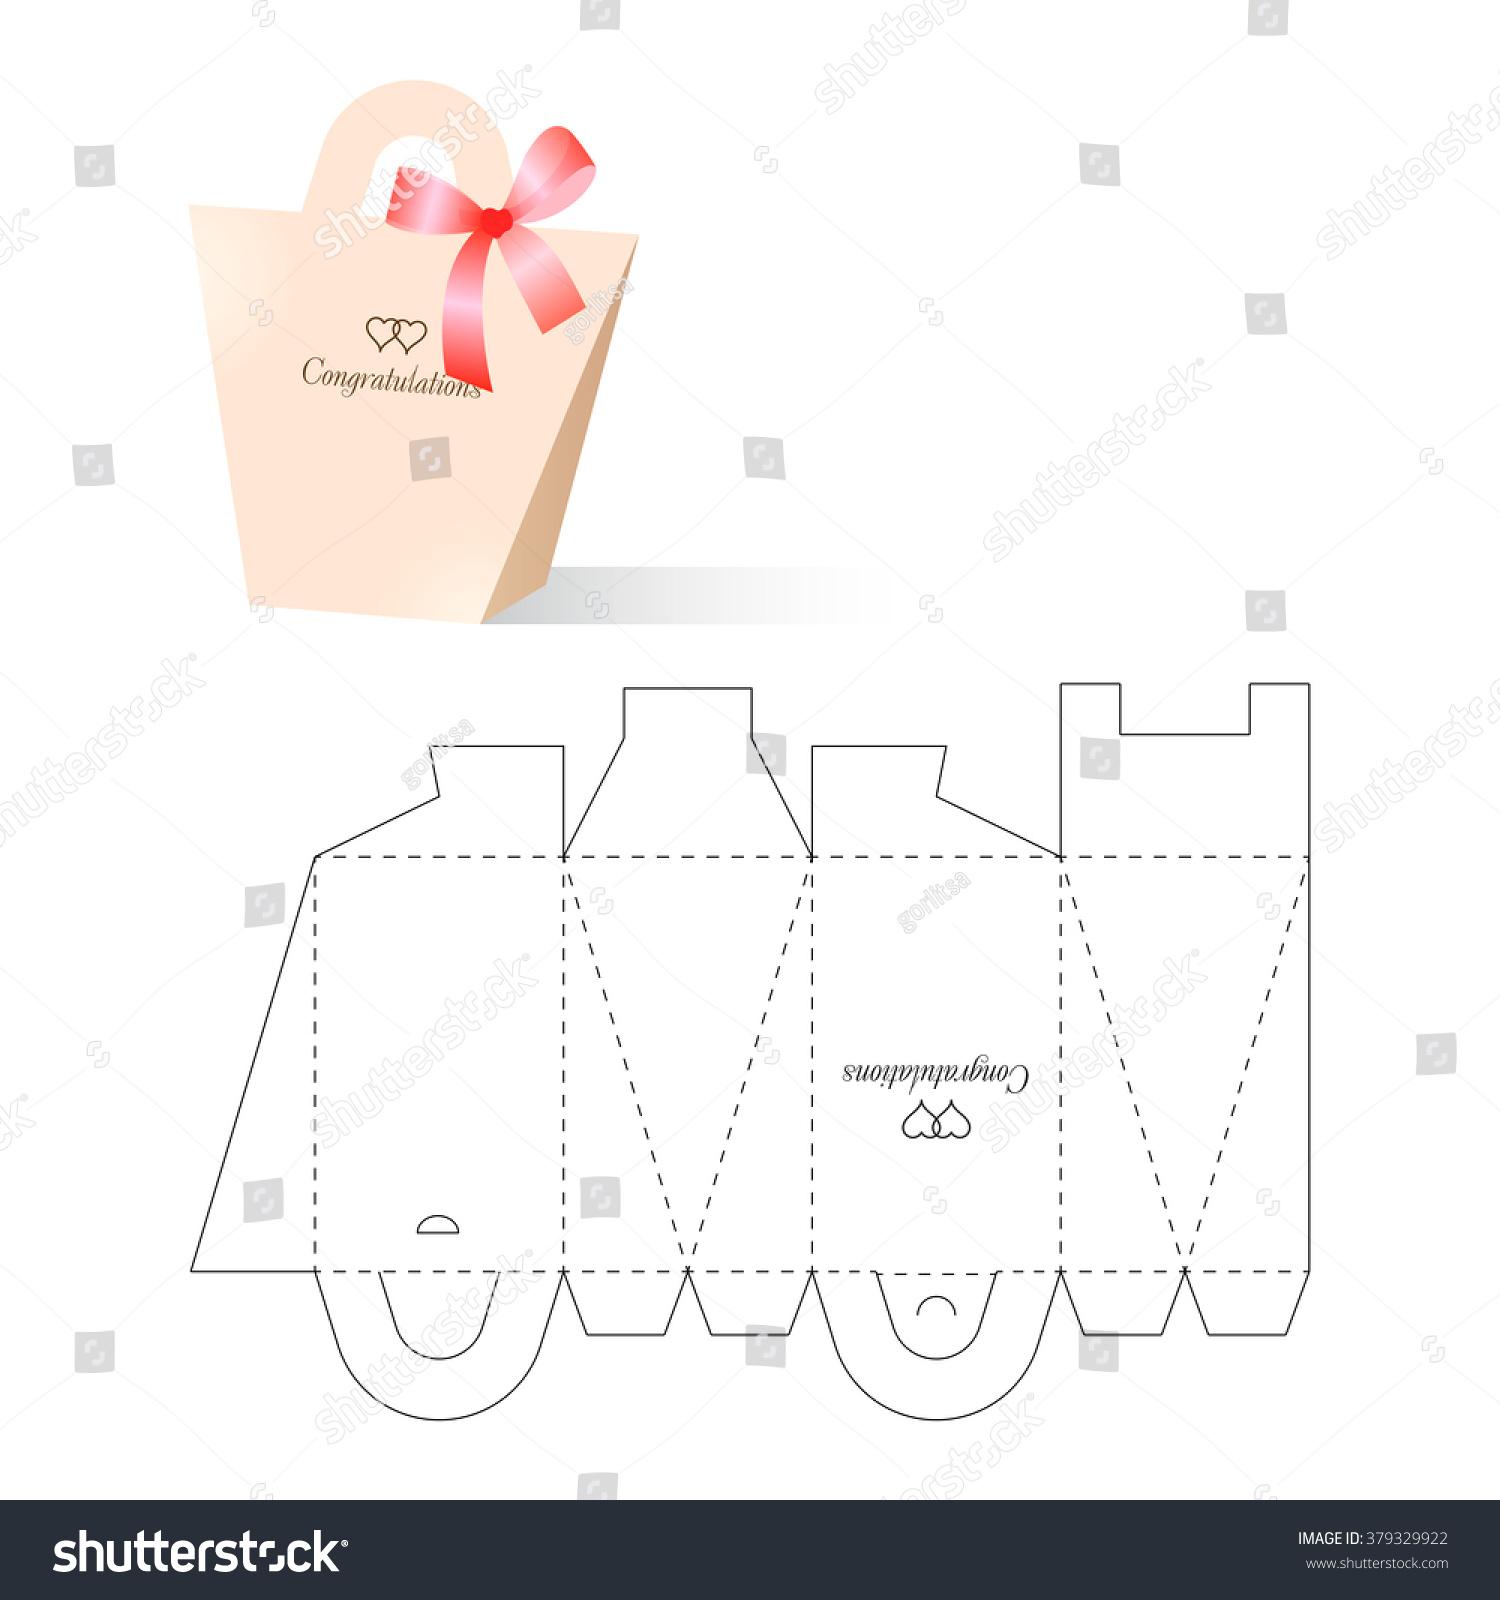 Retail box blueprint template vectores en stock 379329922 shutterstock malvernweather Images